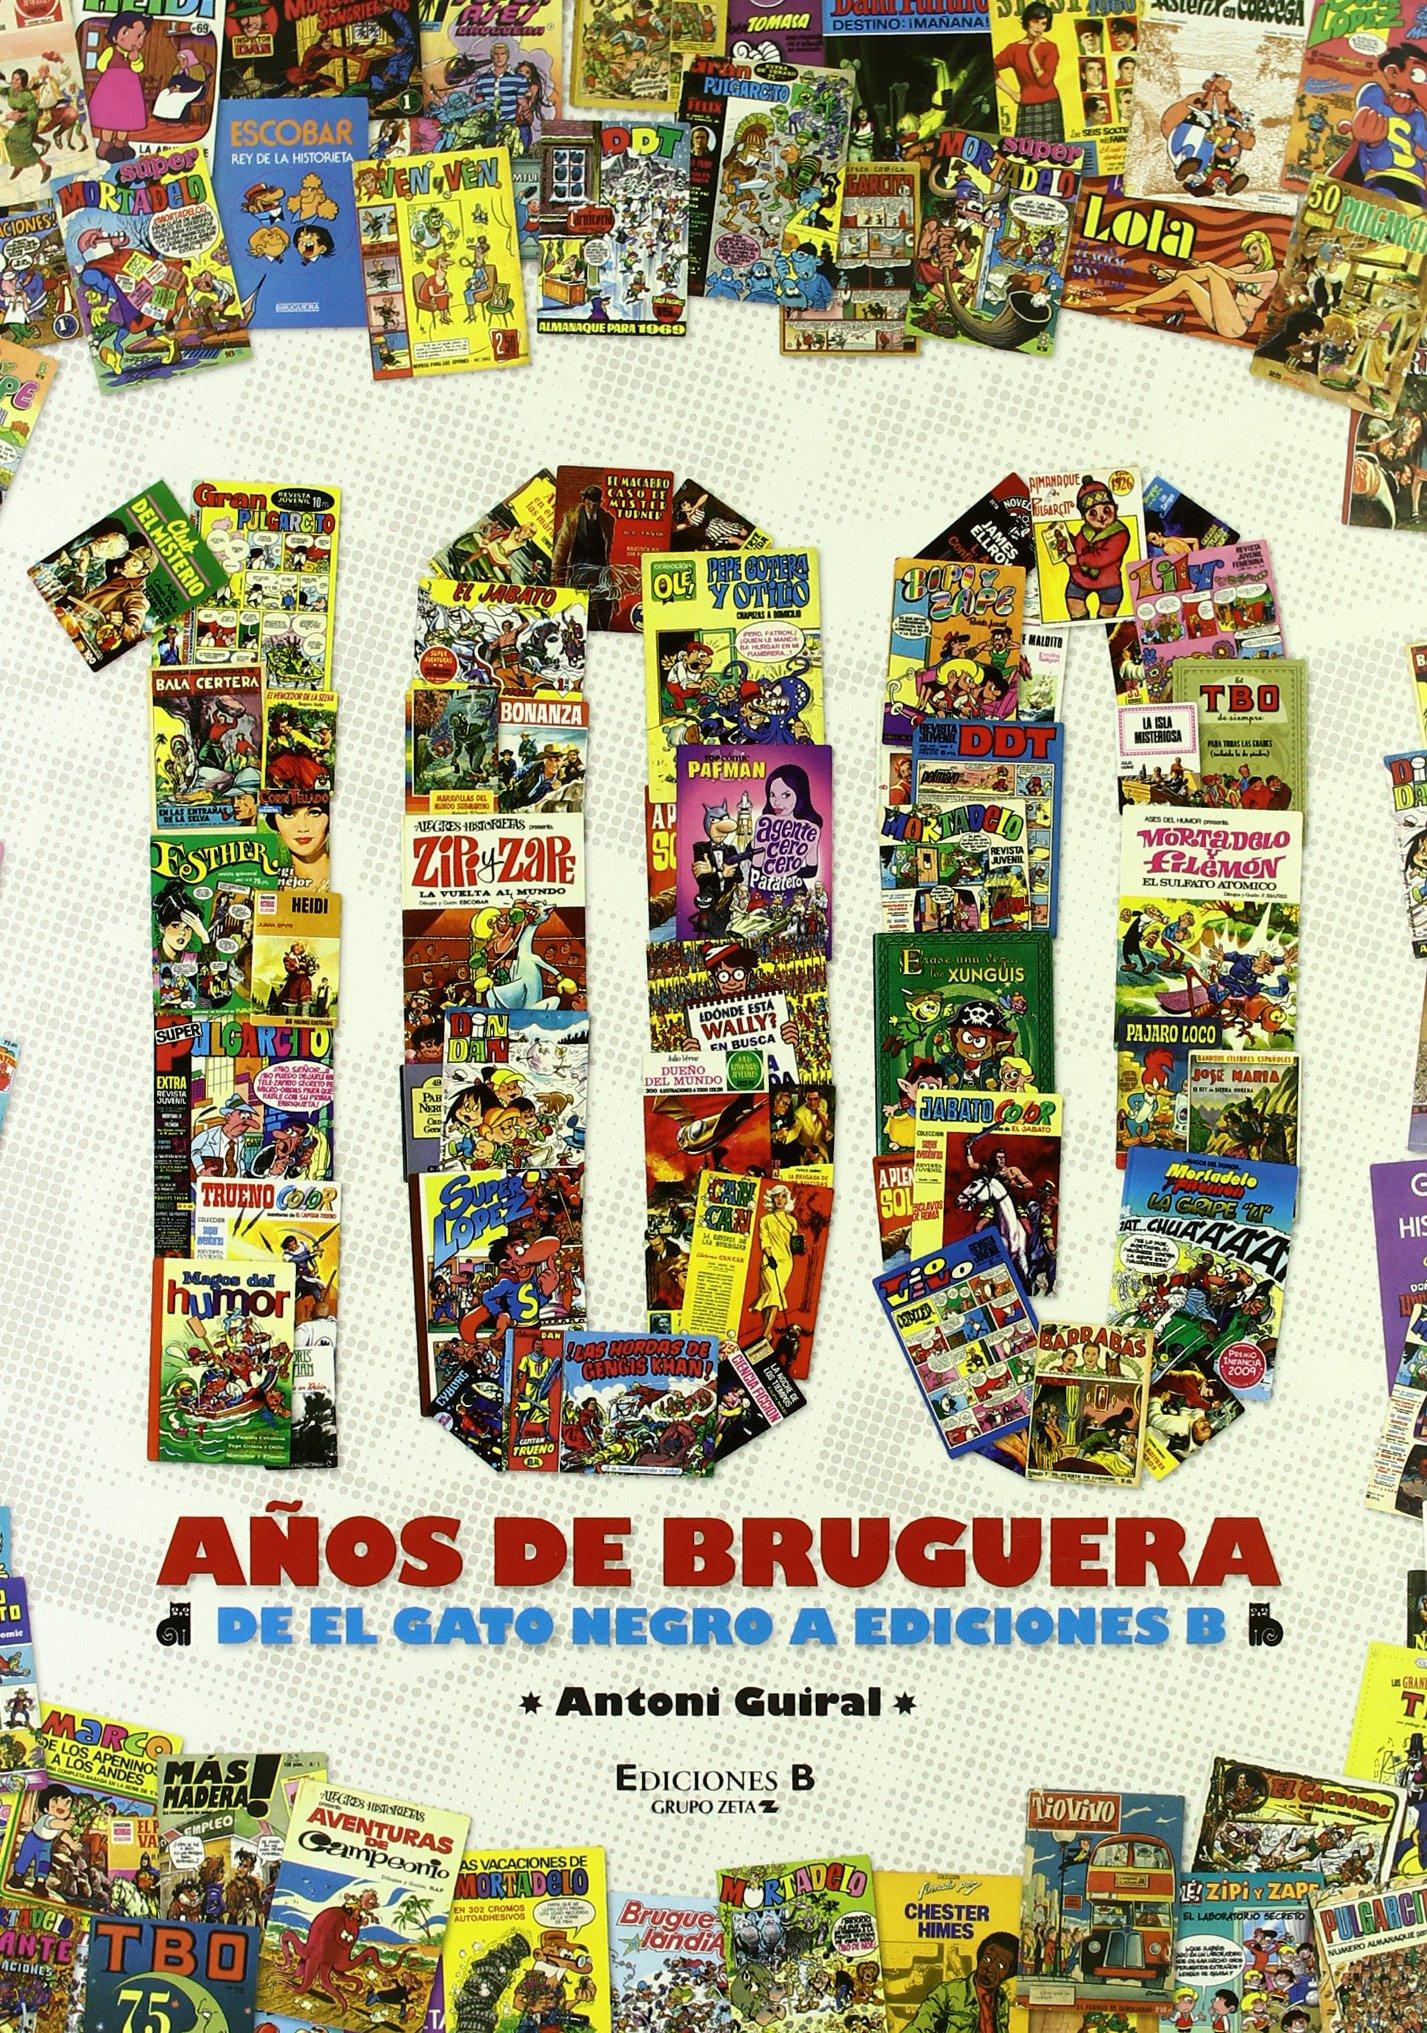 100 anos de Bruguera (Spanish Edition) (Spanish) Hardcover – November 30, 2010